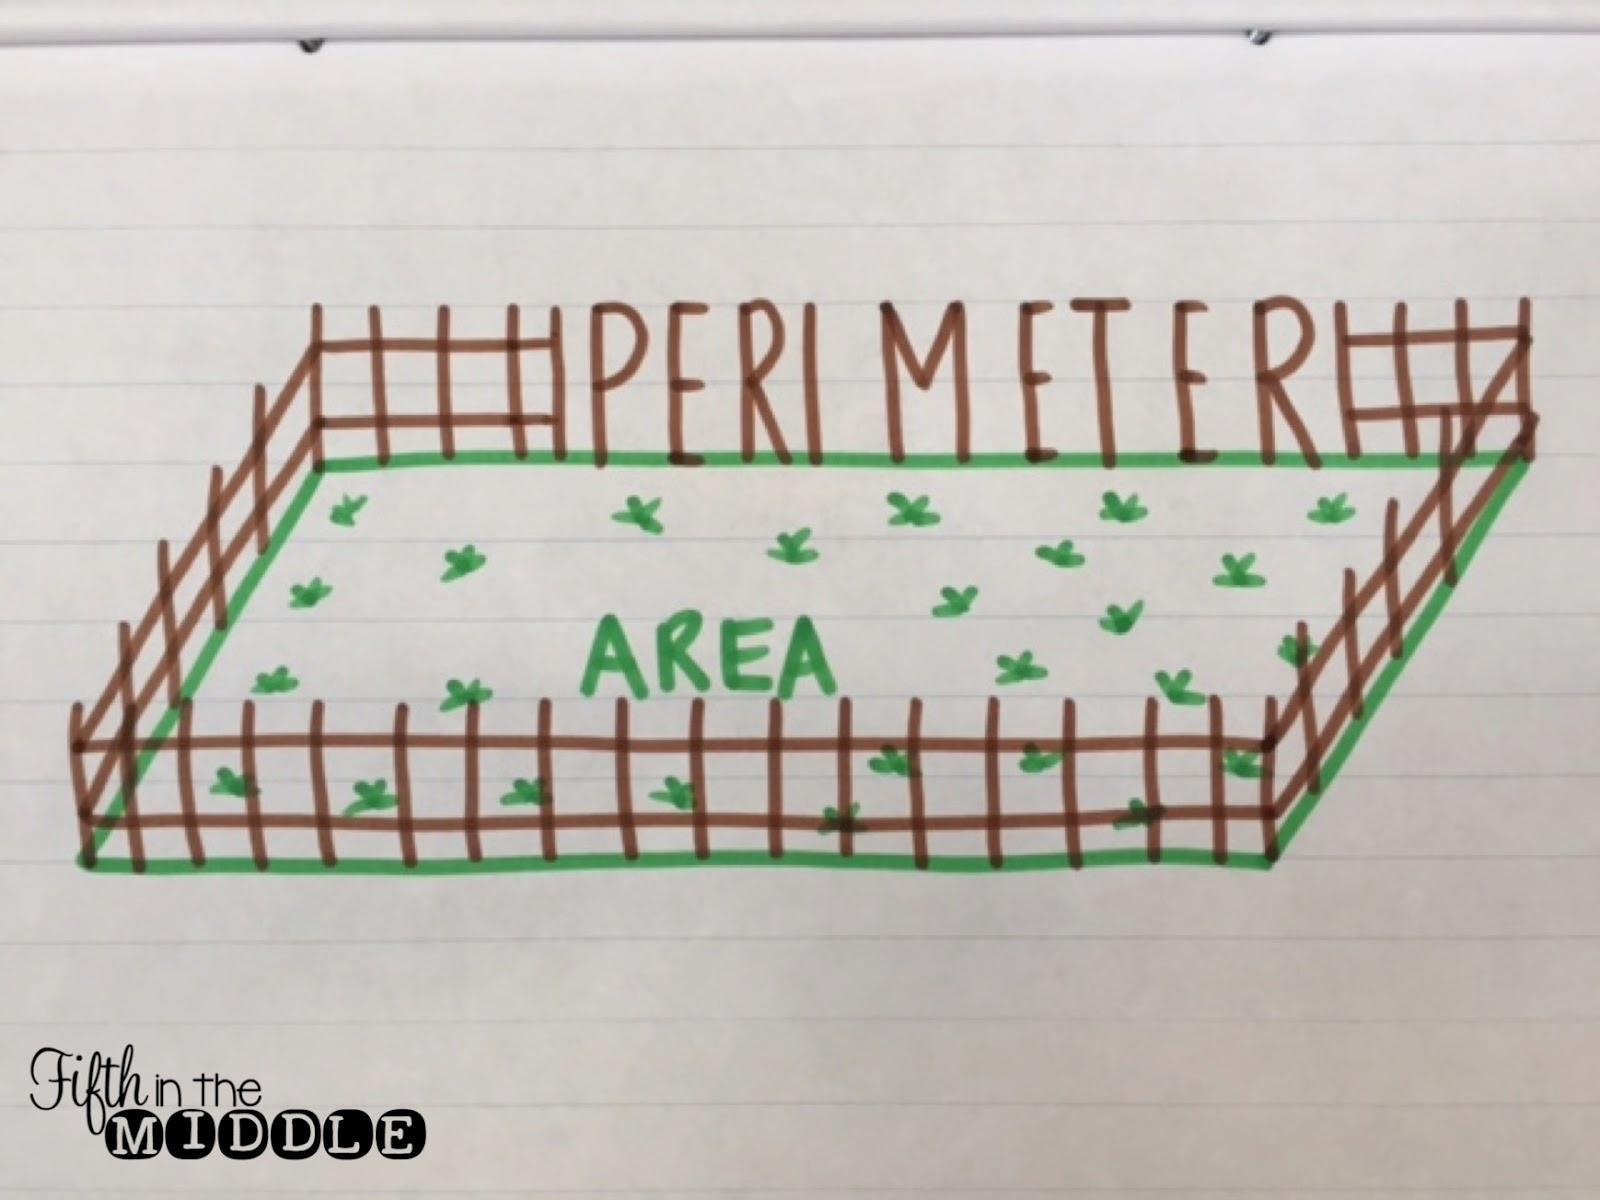 Area perimeter clipart.